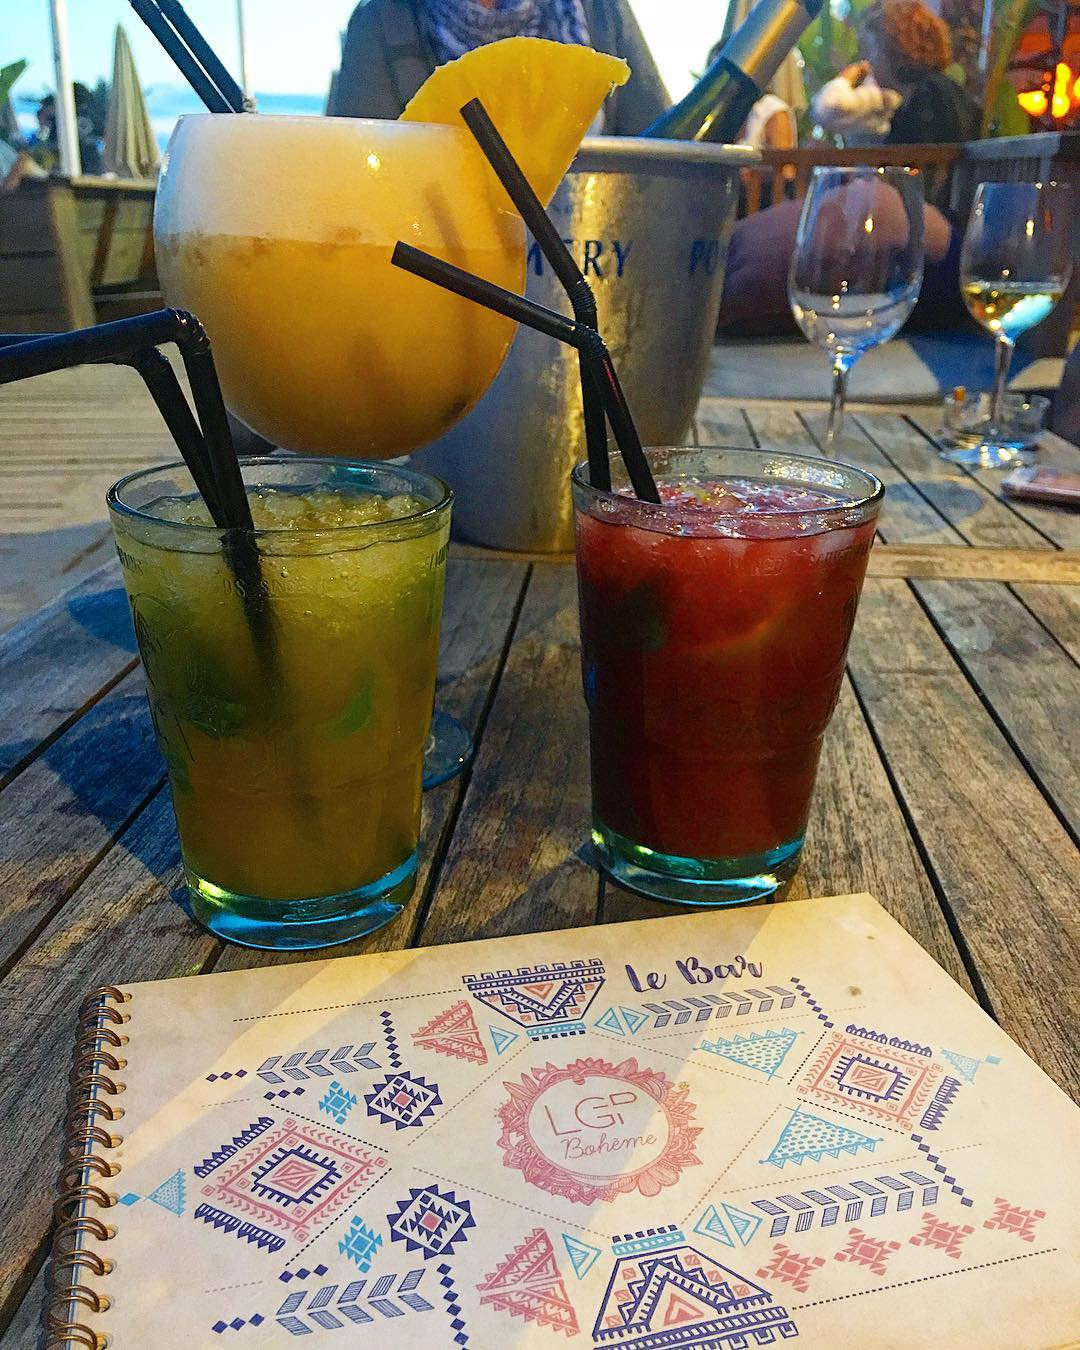 Aller 2ème tournée ... en avant ! ? ____________________ #GrandPlageBohème #lagrandplageboheme #beach #beachlife #plageprivee #sunset #friends #pintademontpellier #montpellier #travelblog #travelblogger #travelphotography #voyage #travelphotography